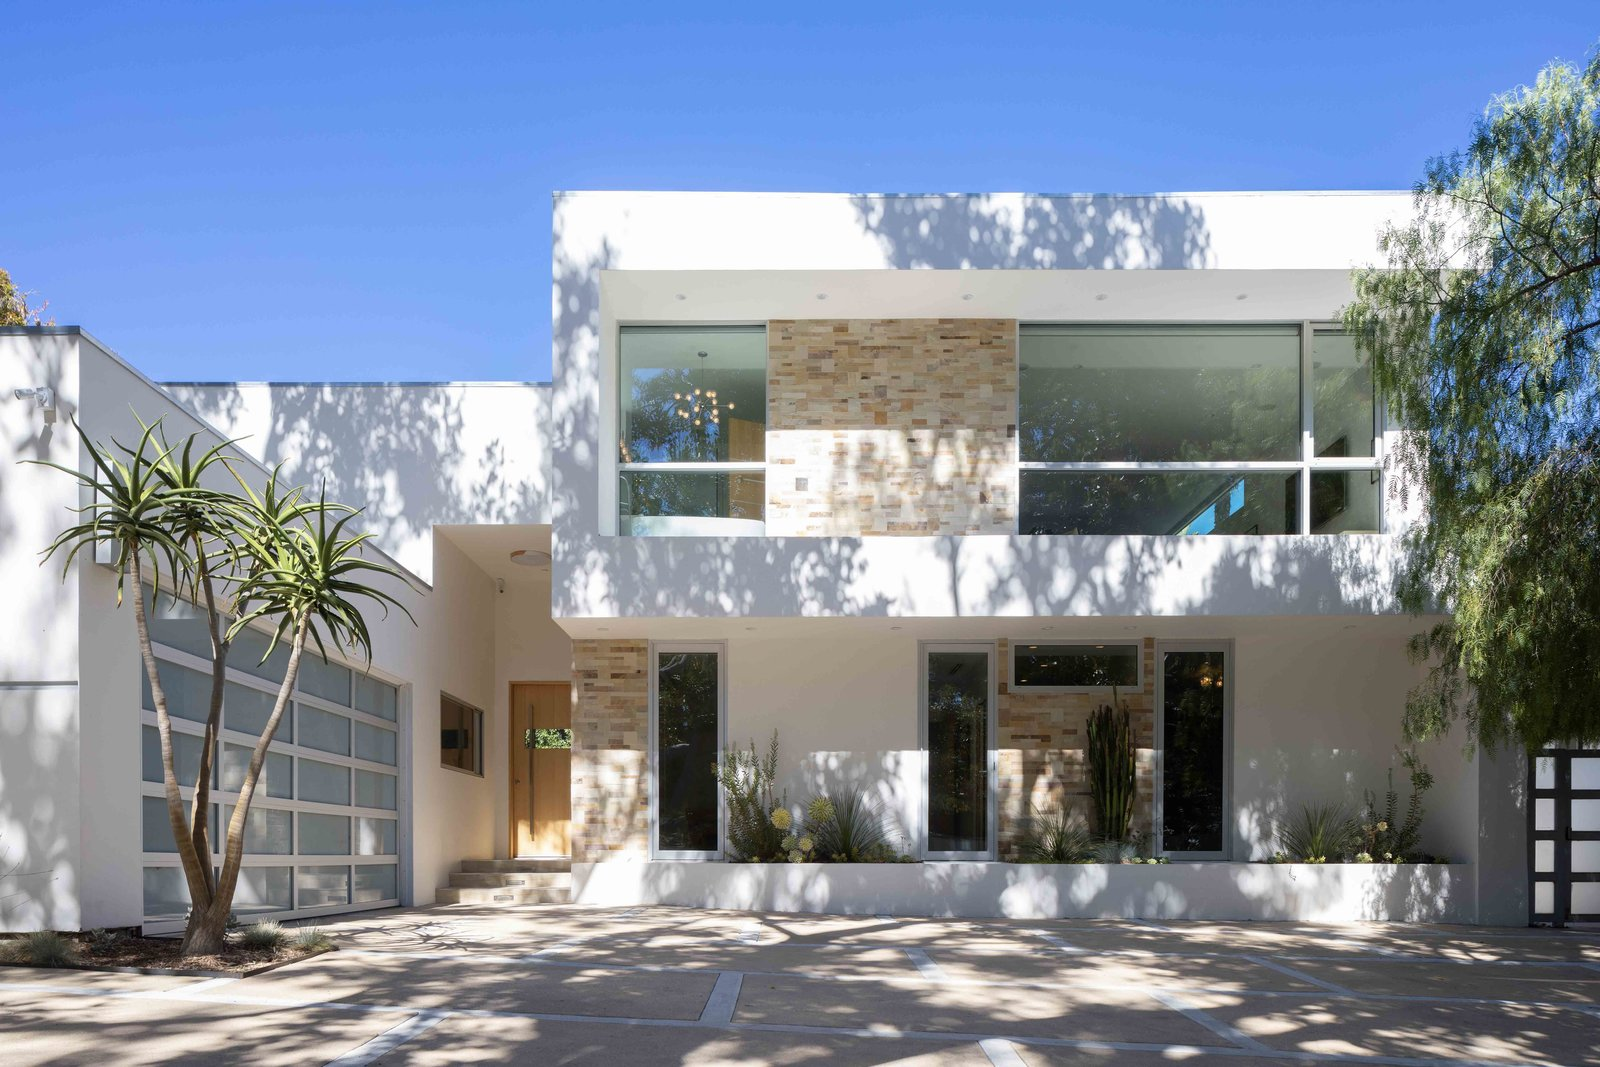 Bruno Bondanelli Los Angeles home exterior